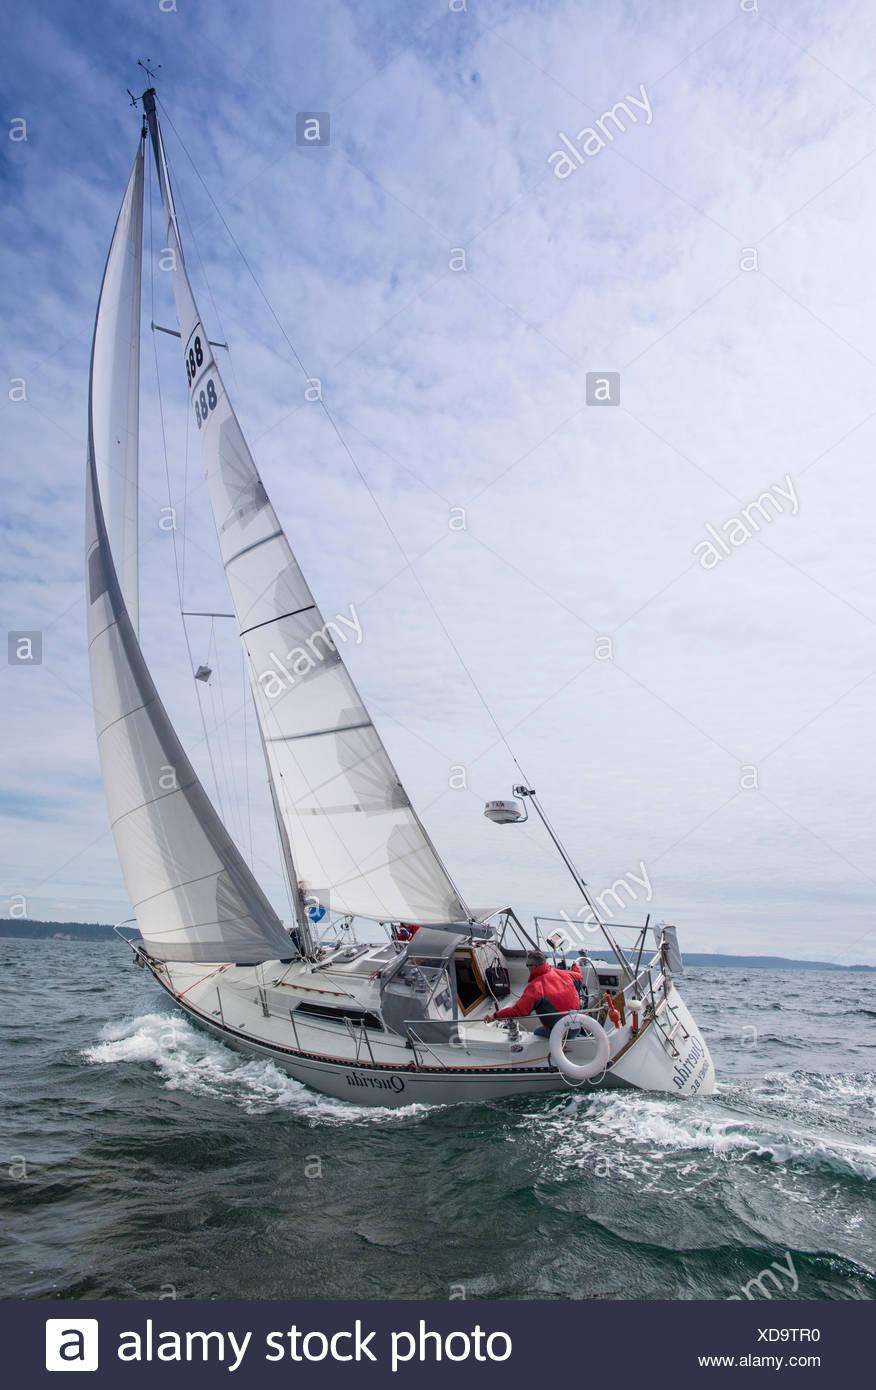 Sailboat racing, Vancouver Island, British Columbia, Canada - Stock Image